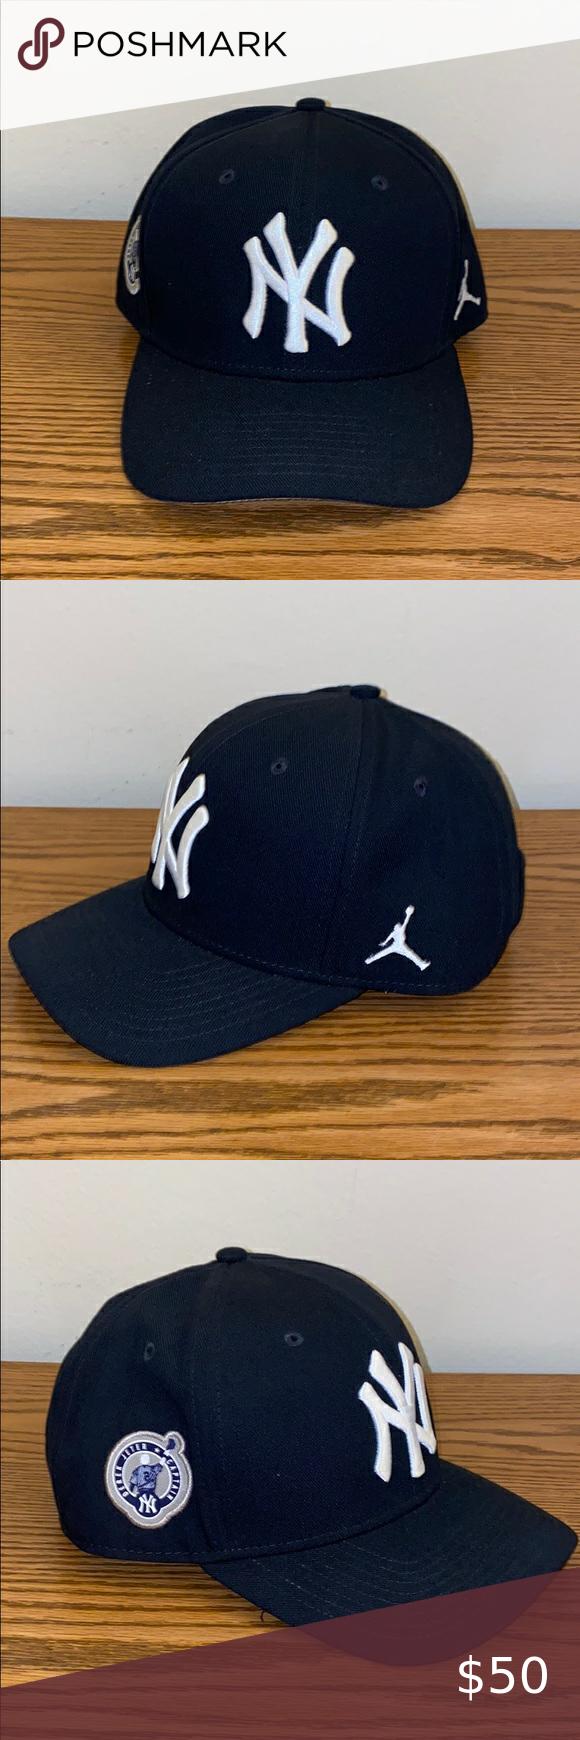 New York Yankees Hat New York Yankee Hat Air Jordans Retro Yankees Hat